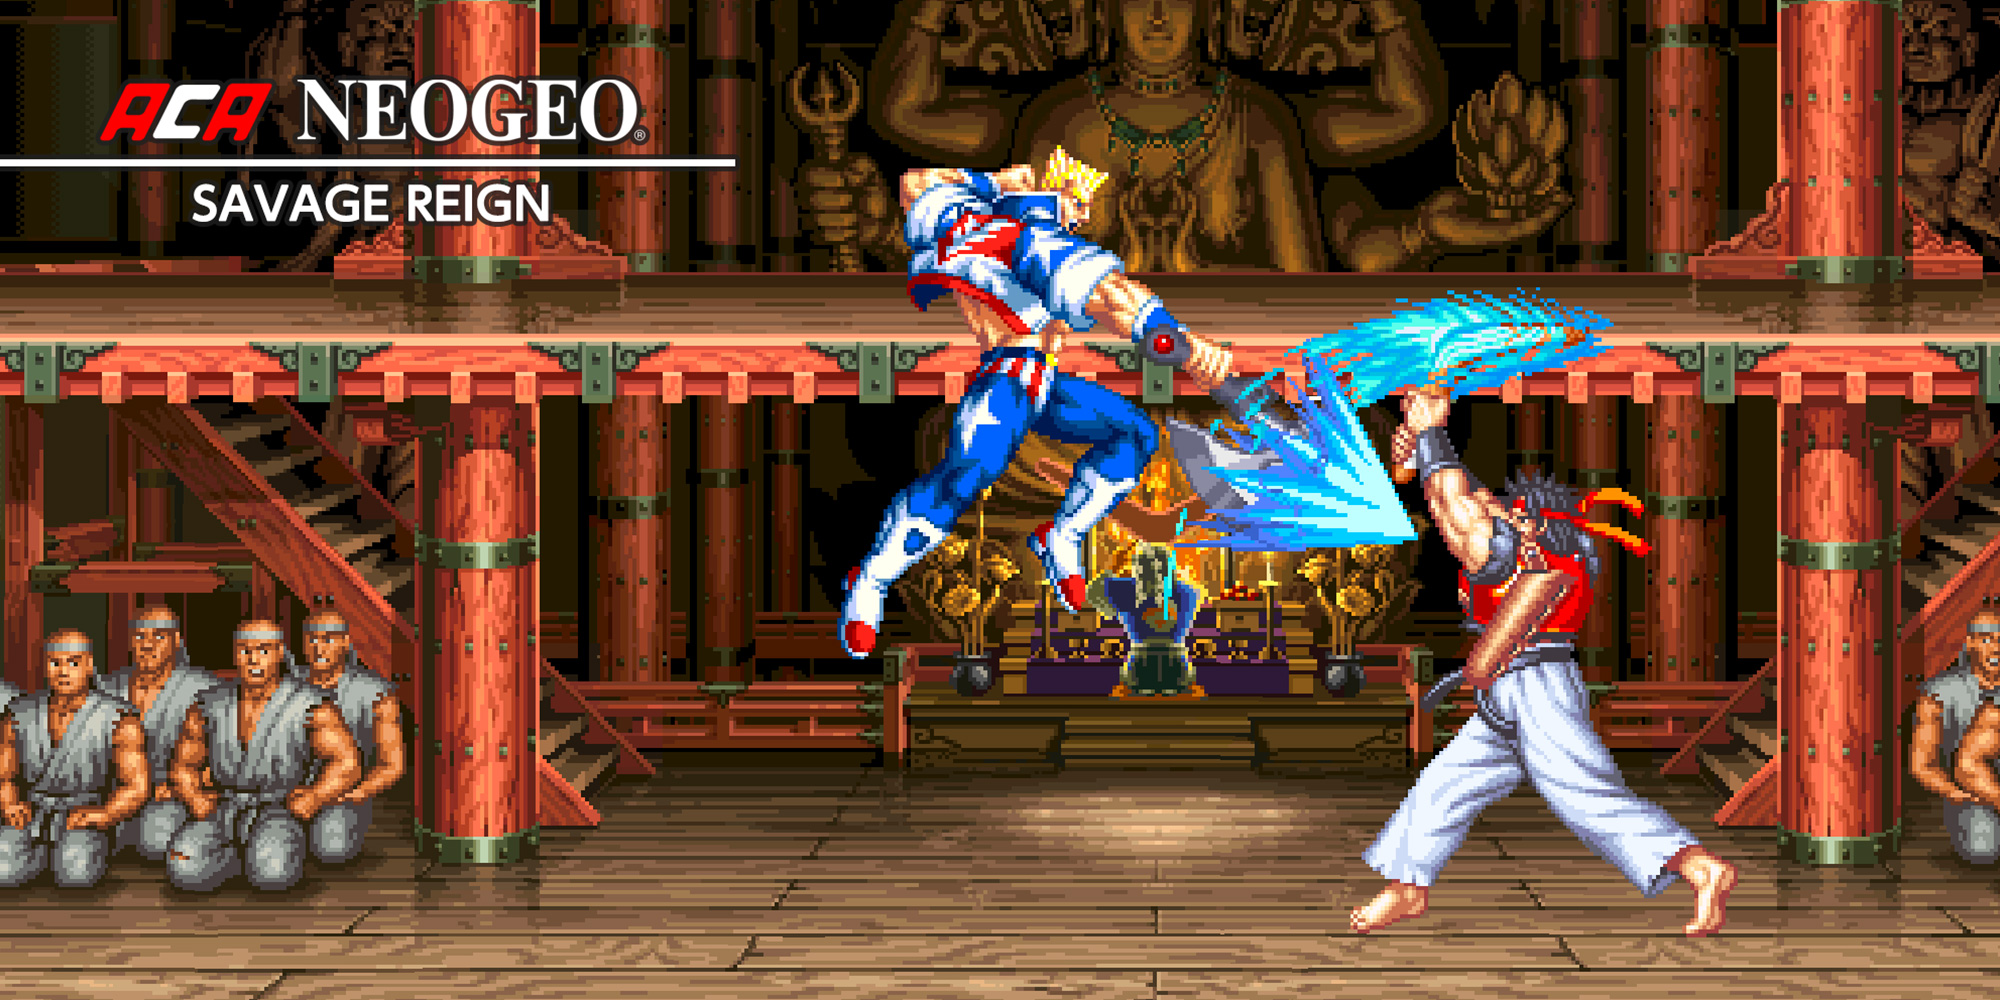 Savage reign (neogeo) download game ps1 psp roms isos | downarea51.